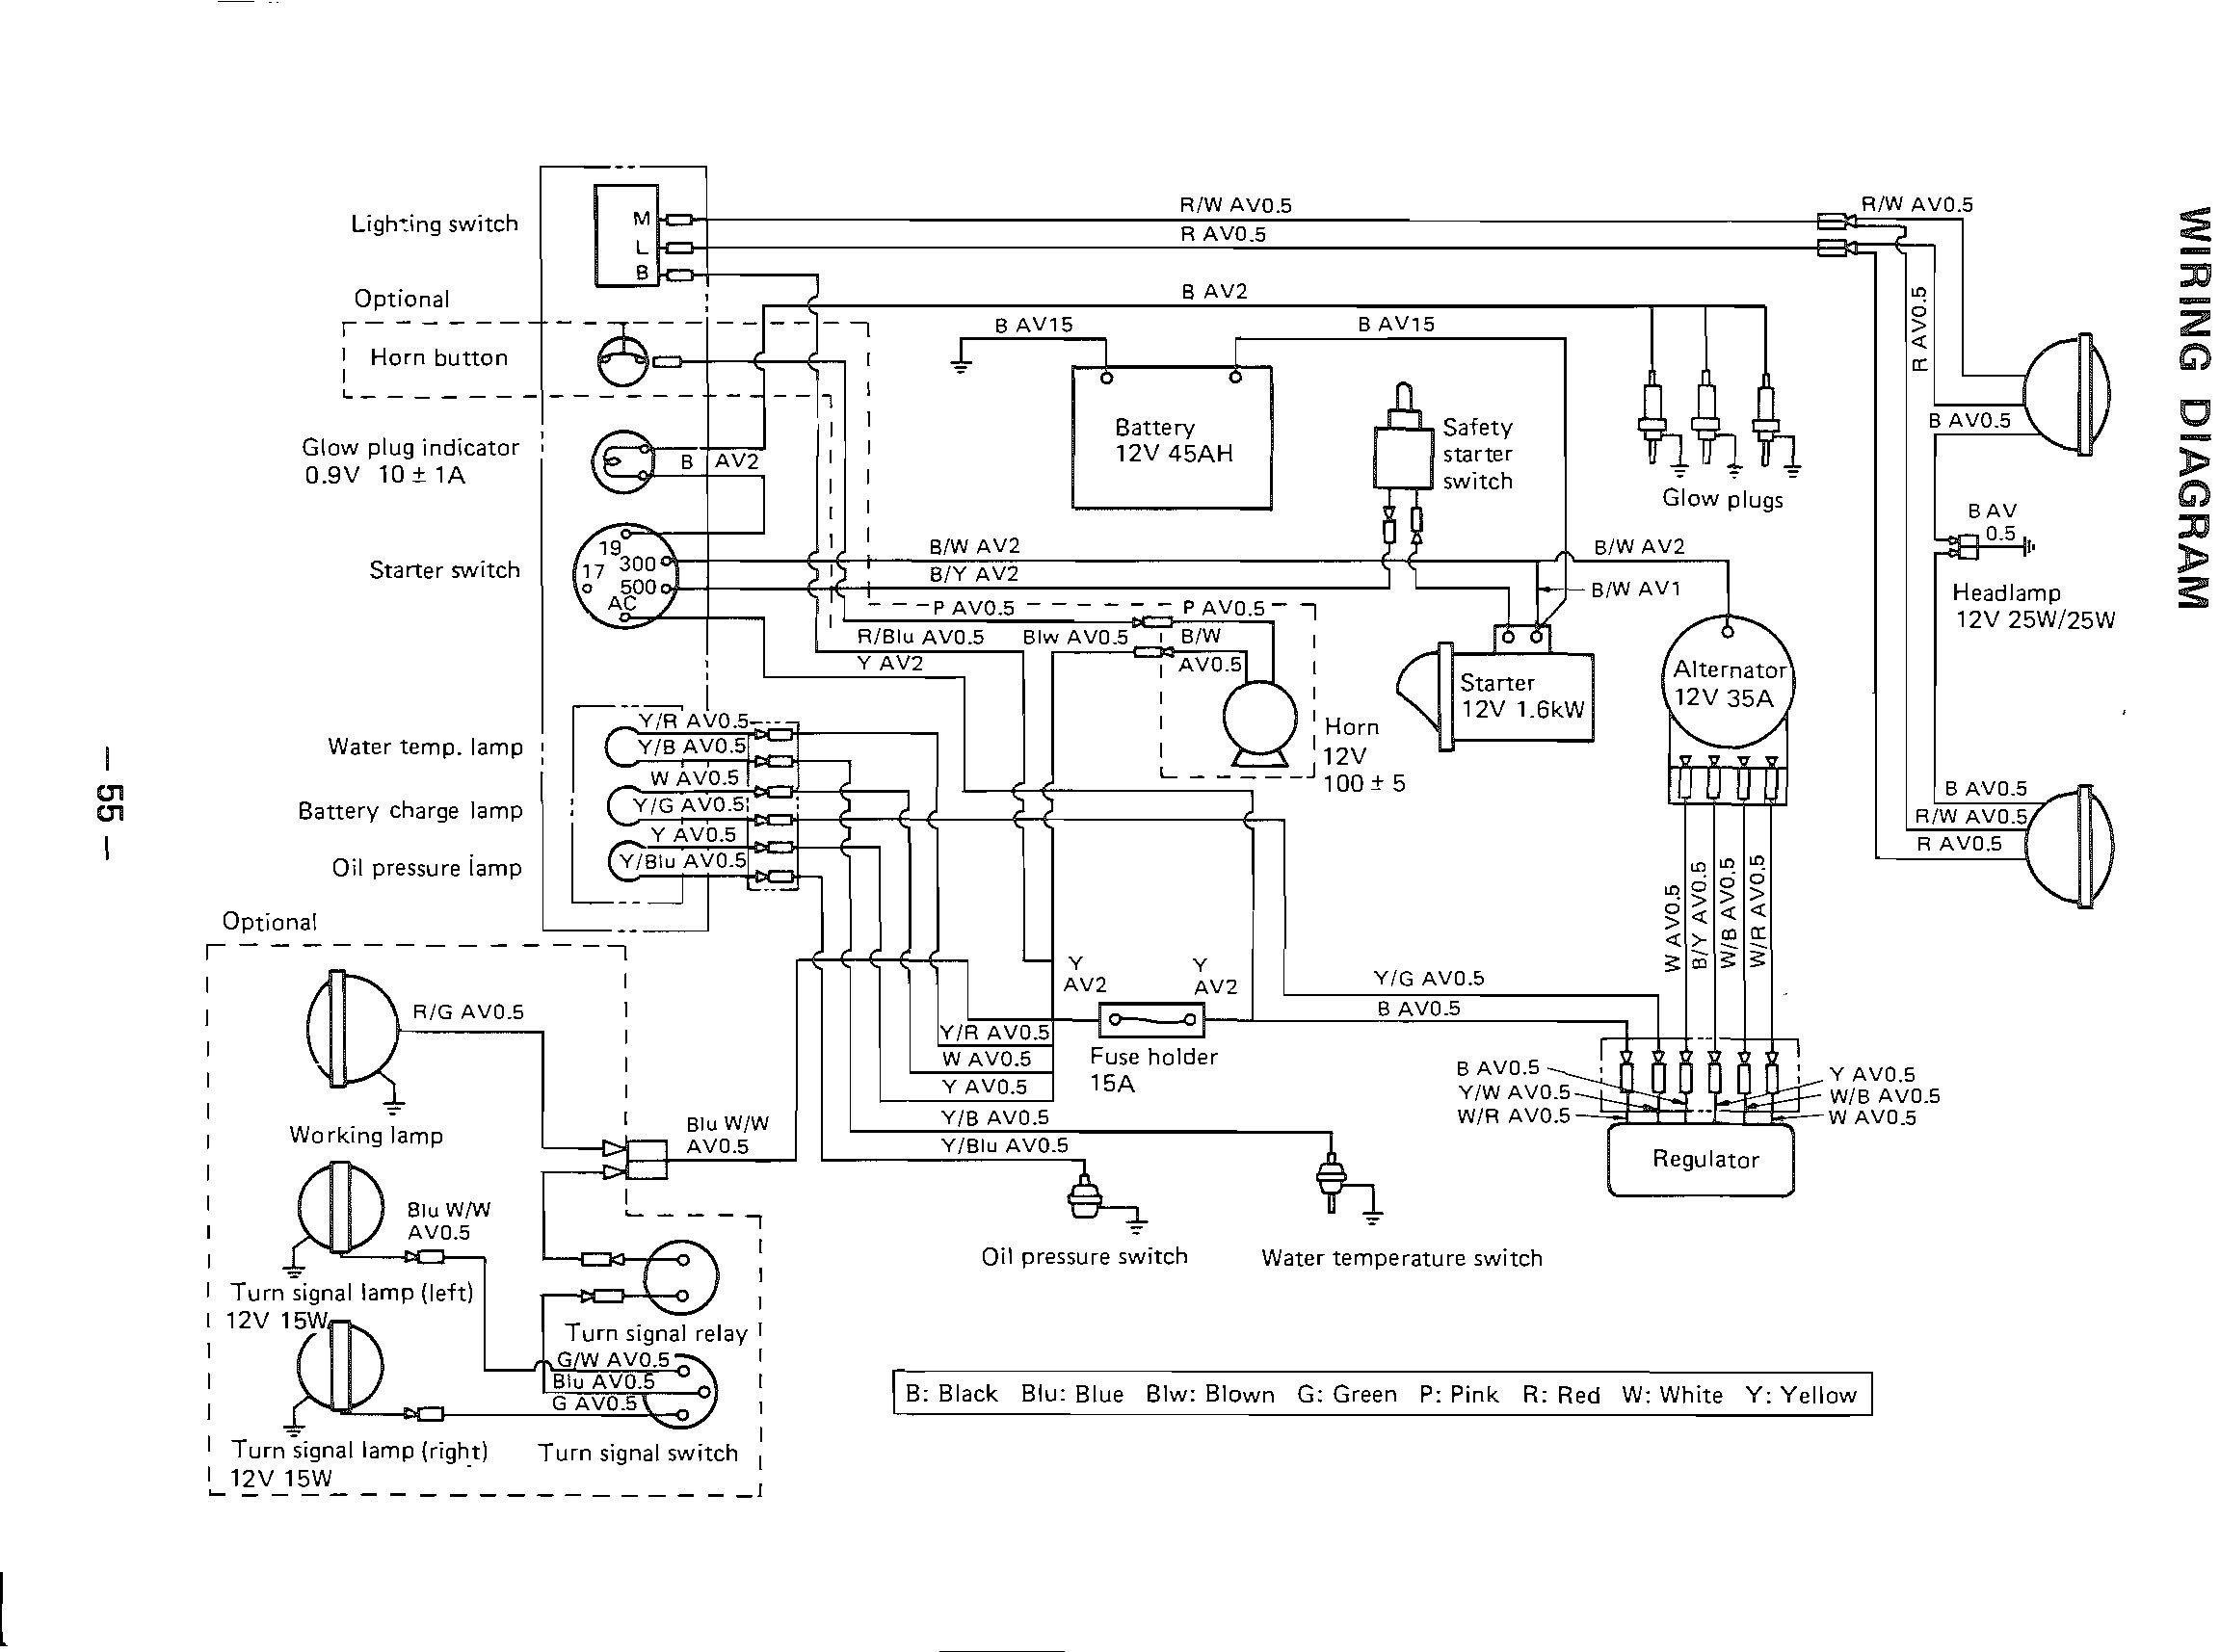 Massey Ferguson 135 Wiring Diagram Generator New Massey Ferguson 135 Wiring Diagram Alternator Inspirationa Unique Mf